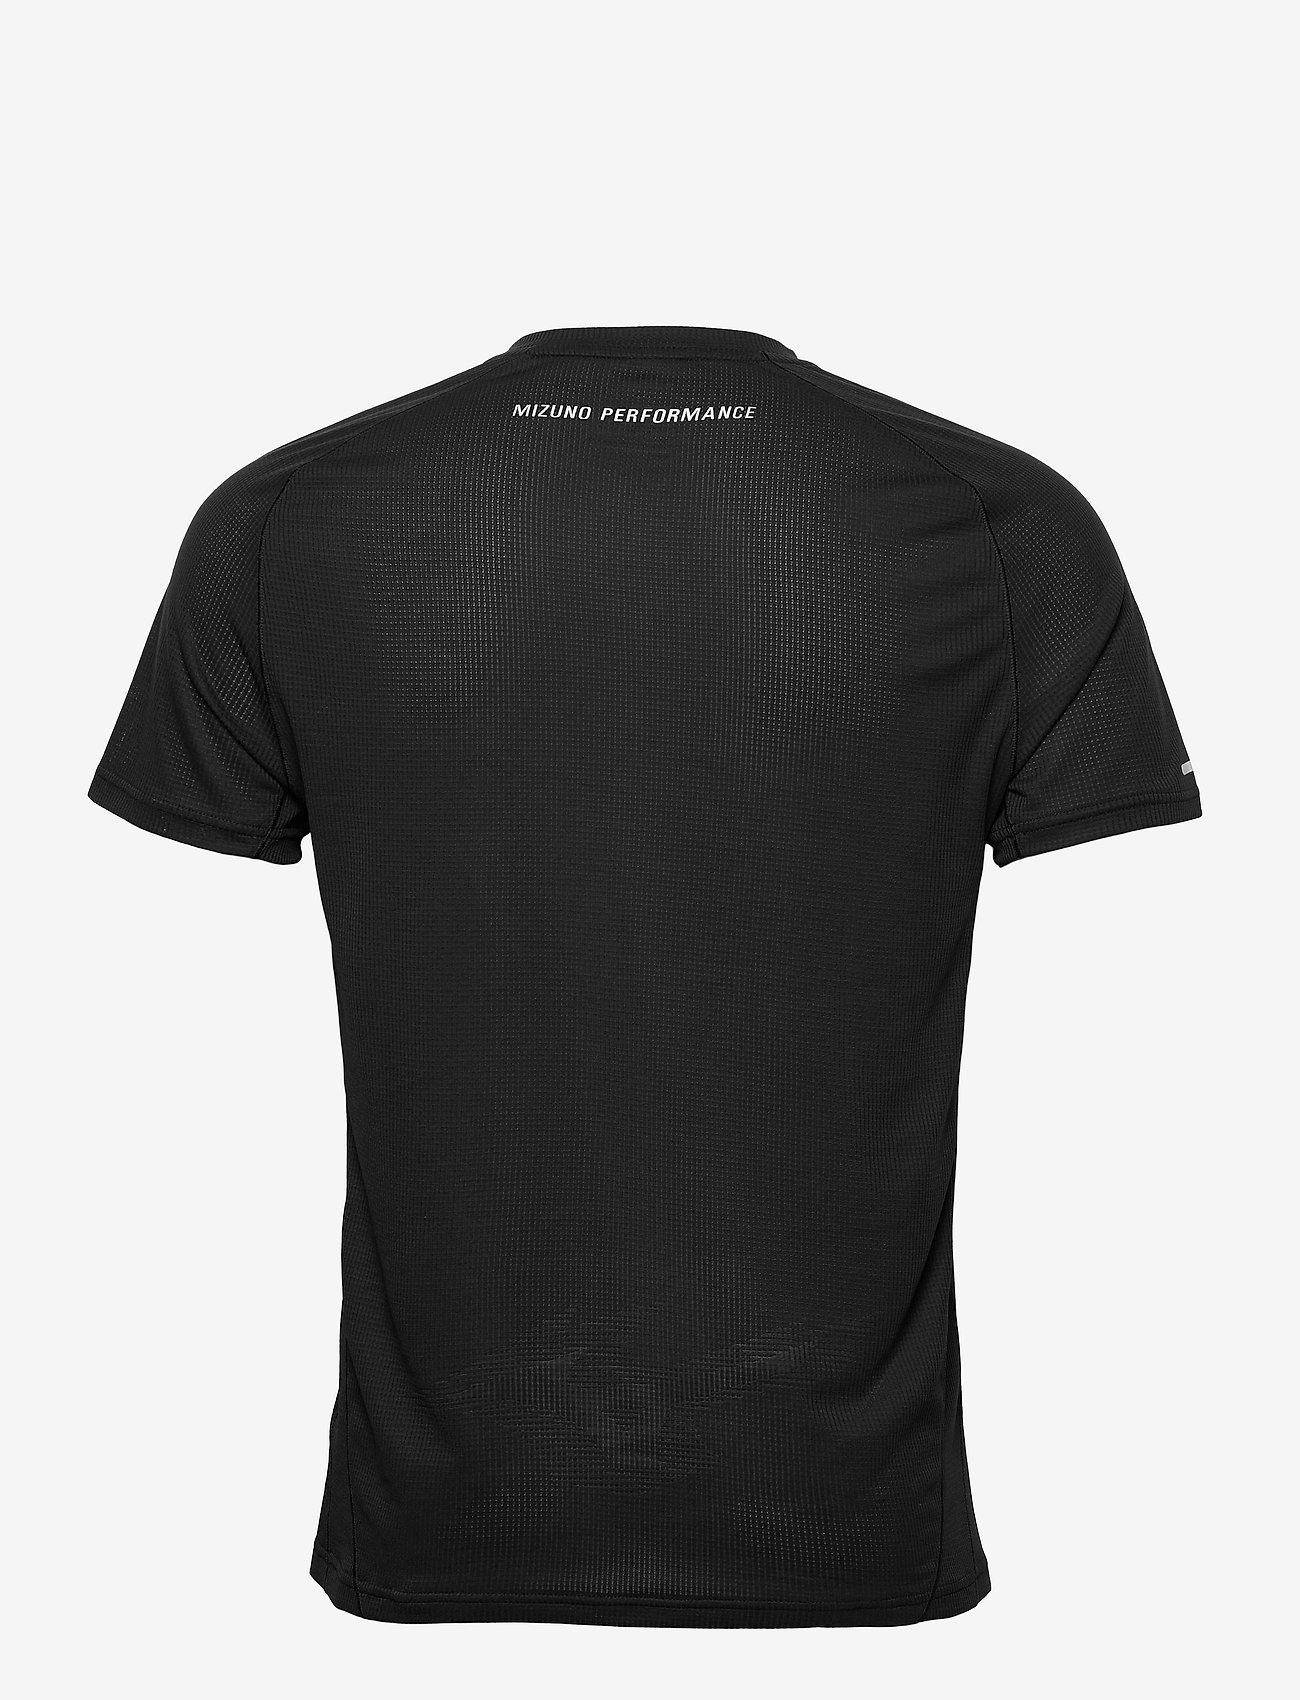 Mizuno - DryAeroFlow Tee(M) - t-shirts - black - 1